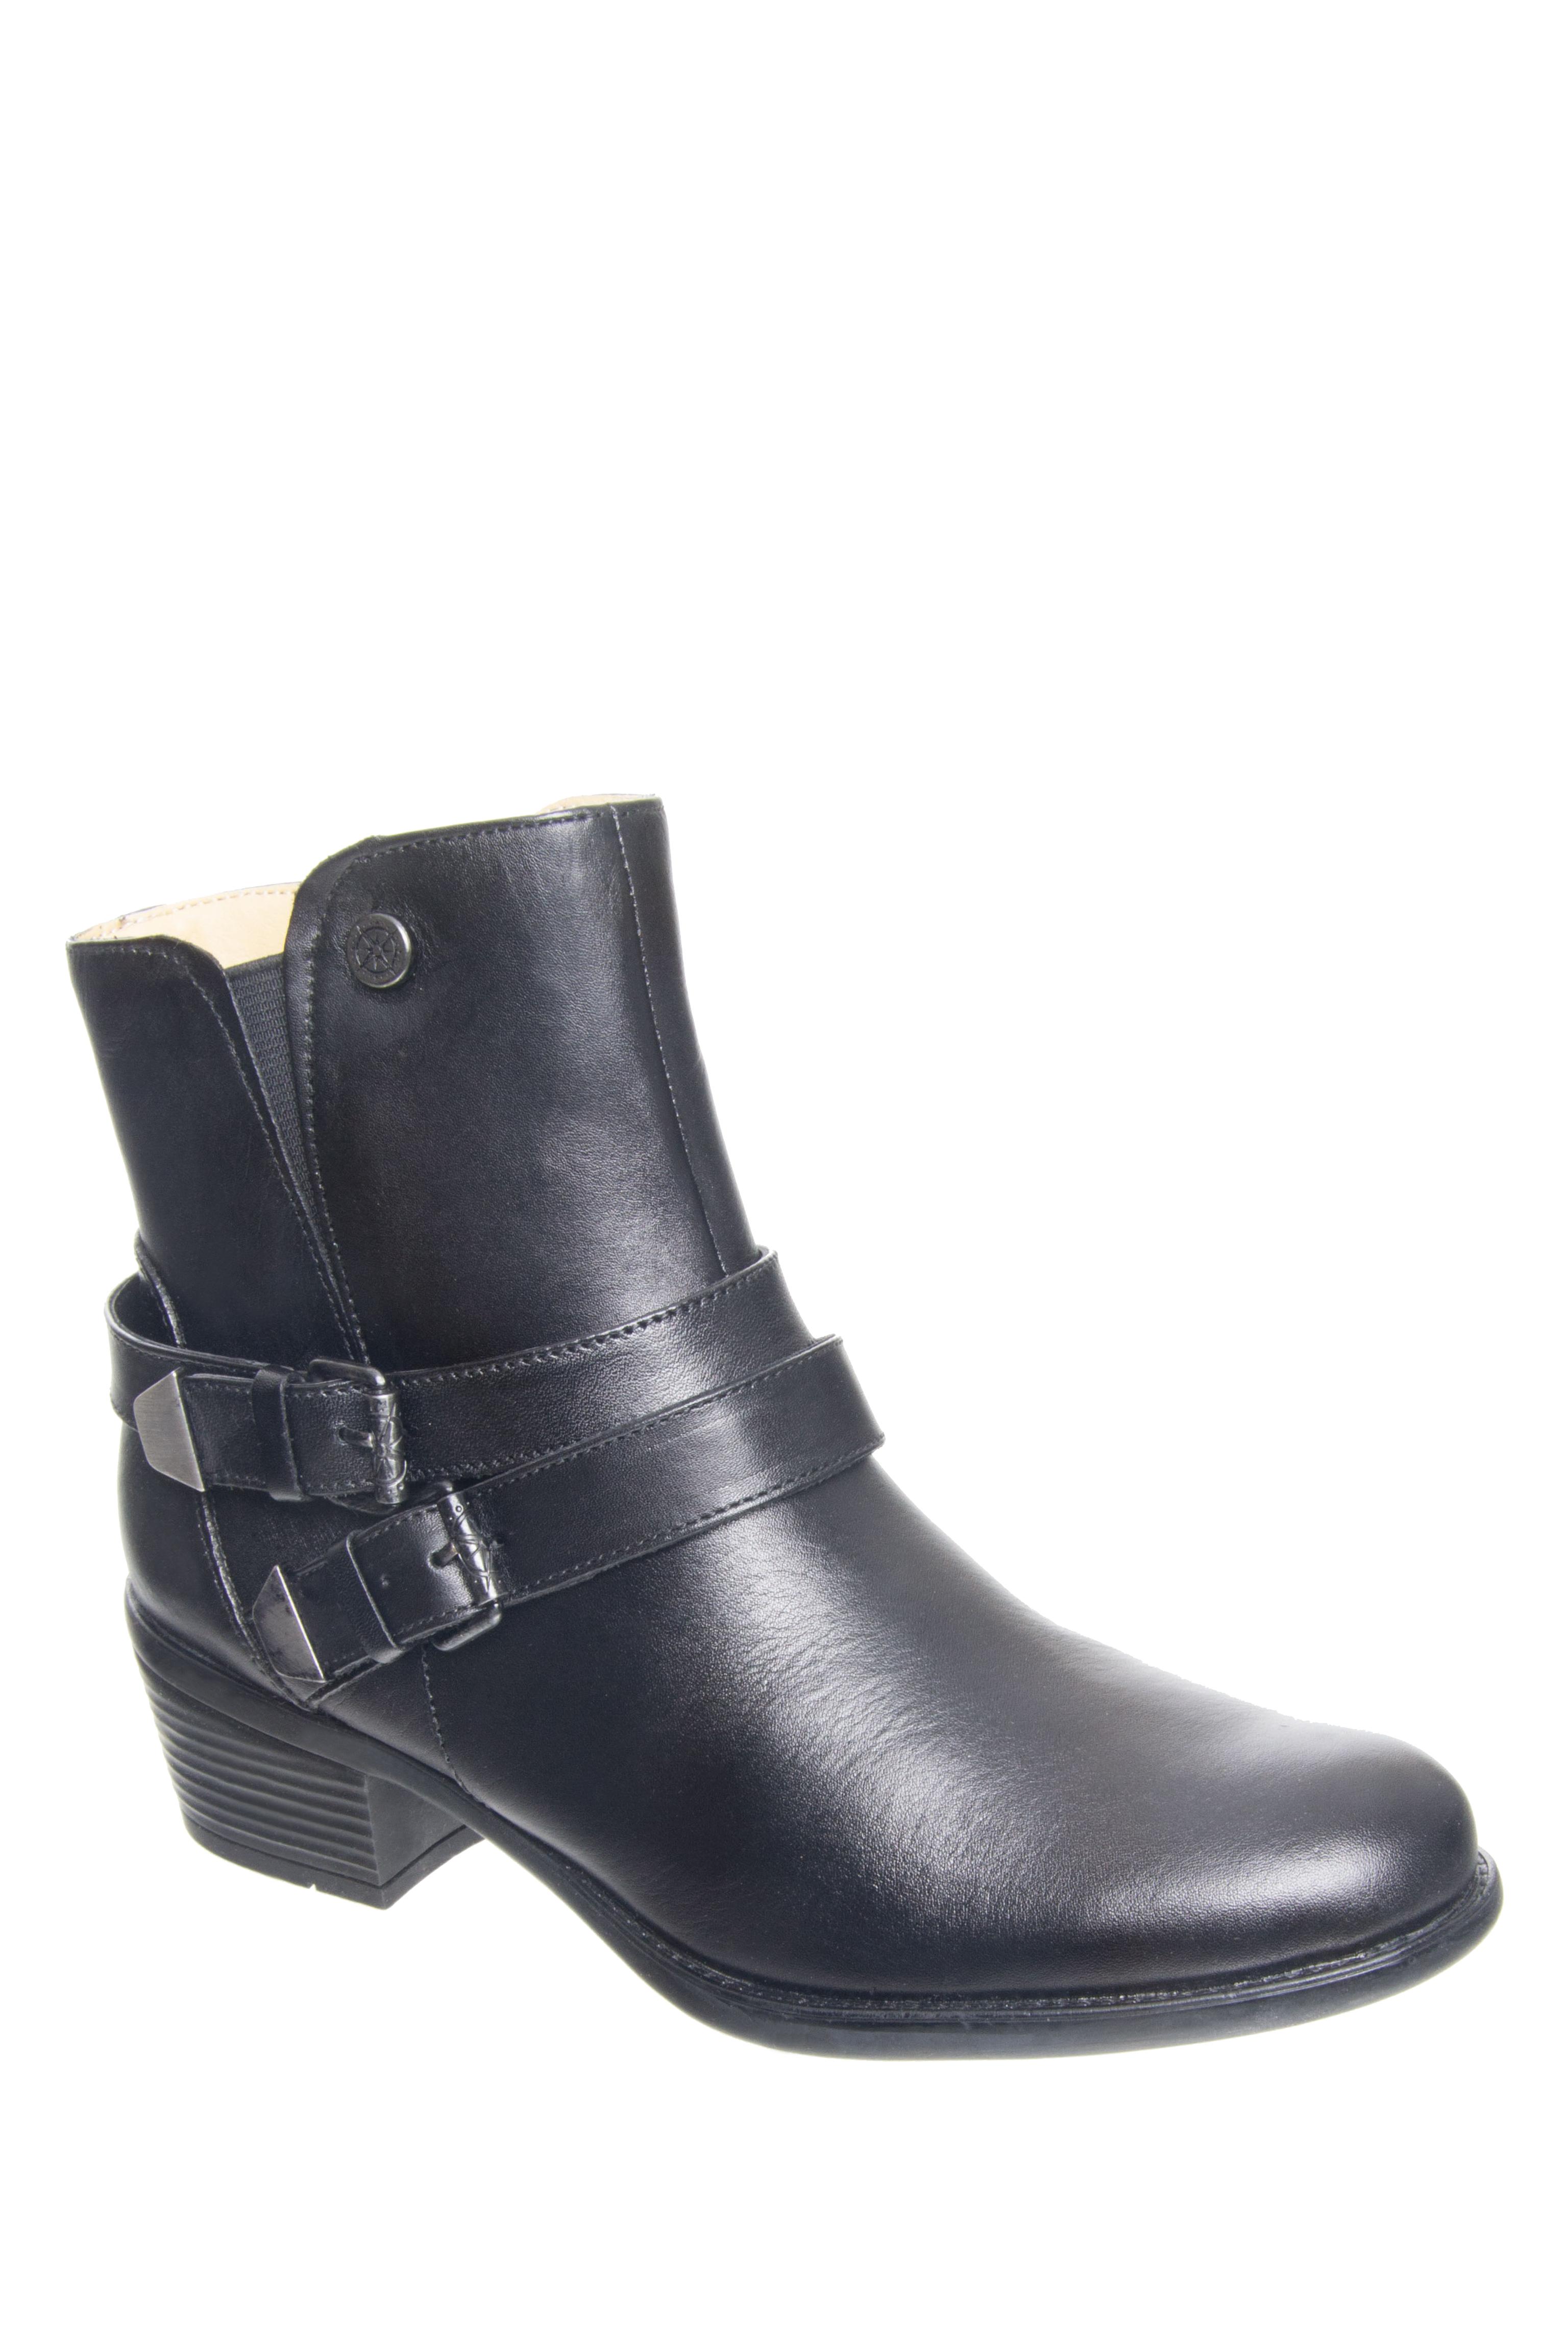 Bussola Avy Mid Heel Boots - Black